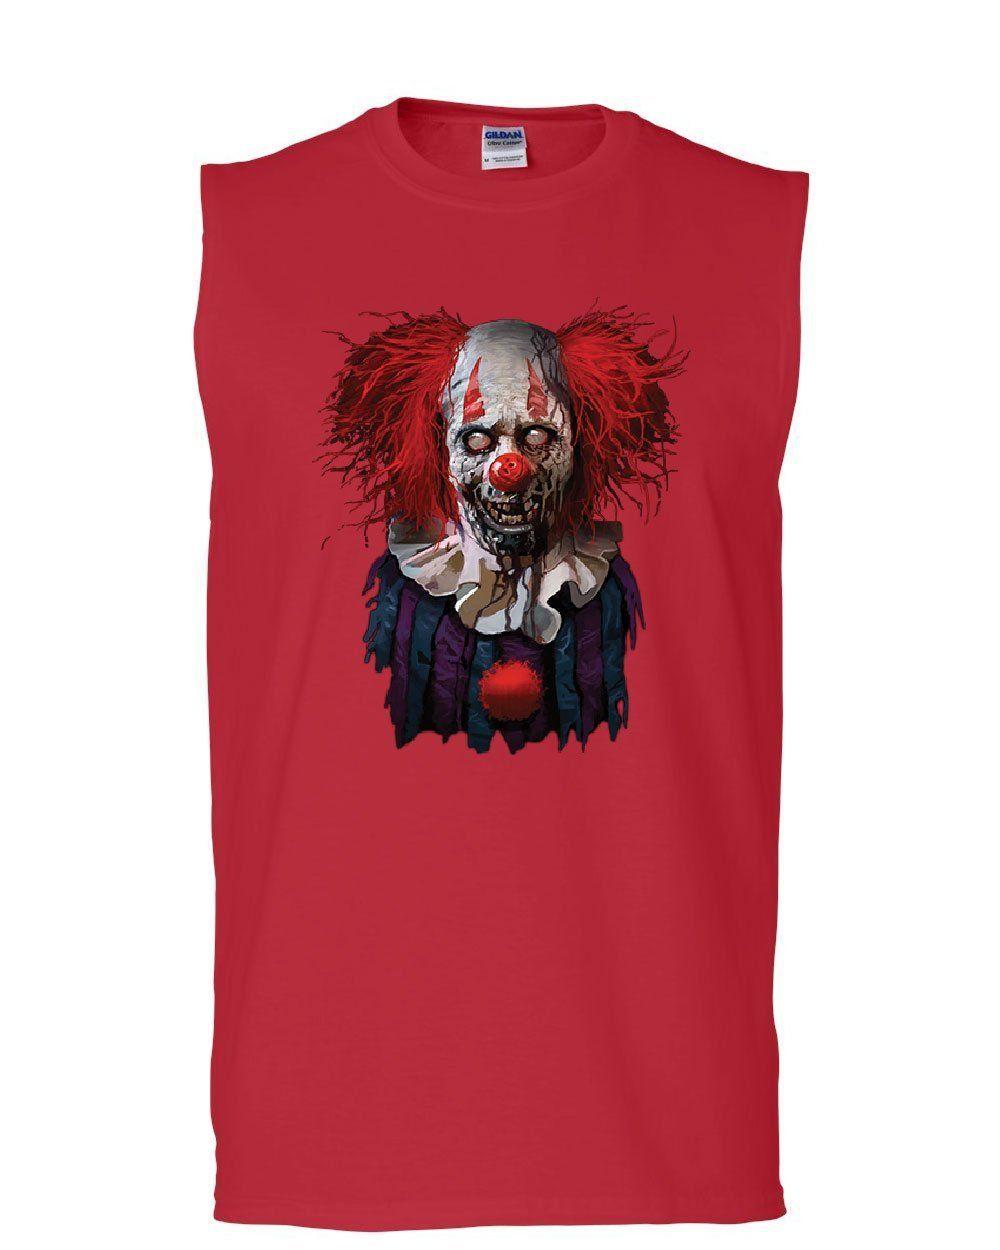 Tee Hunt Undead Zombie Clown Muscle Shirt Scary Creepy Horror Nightmare Fobia Sleeveless